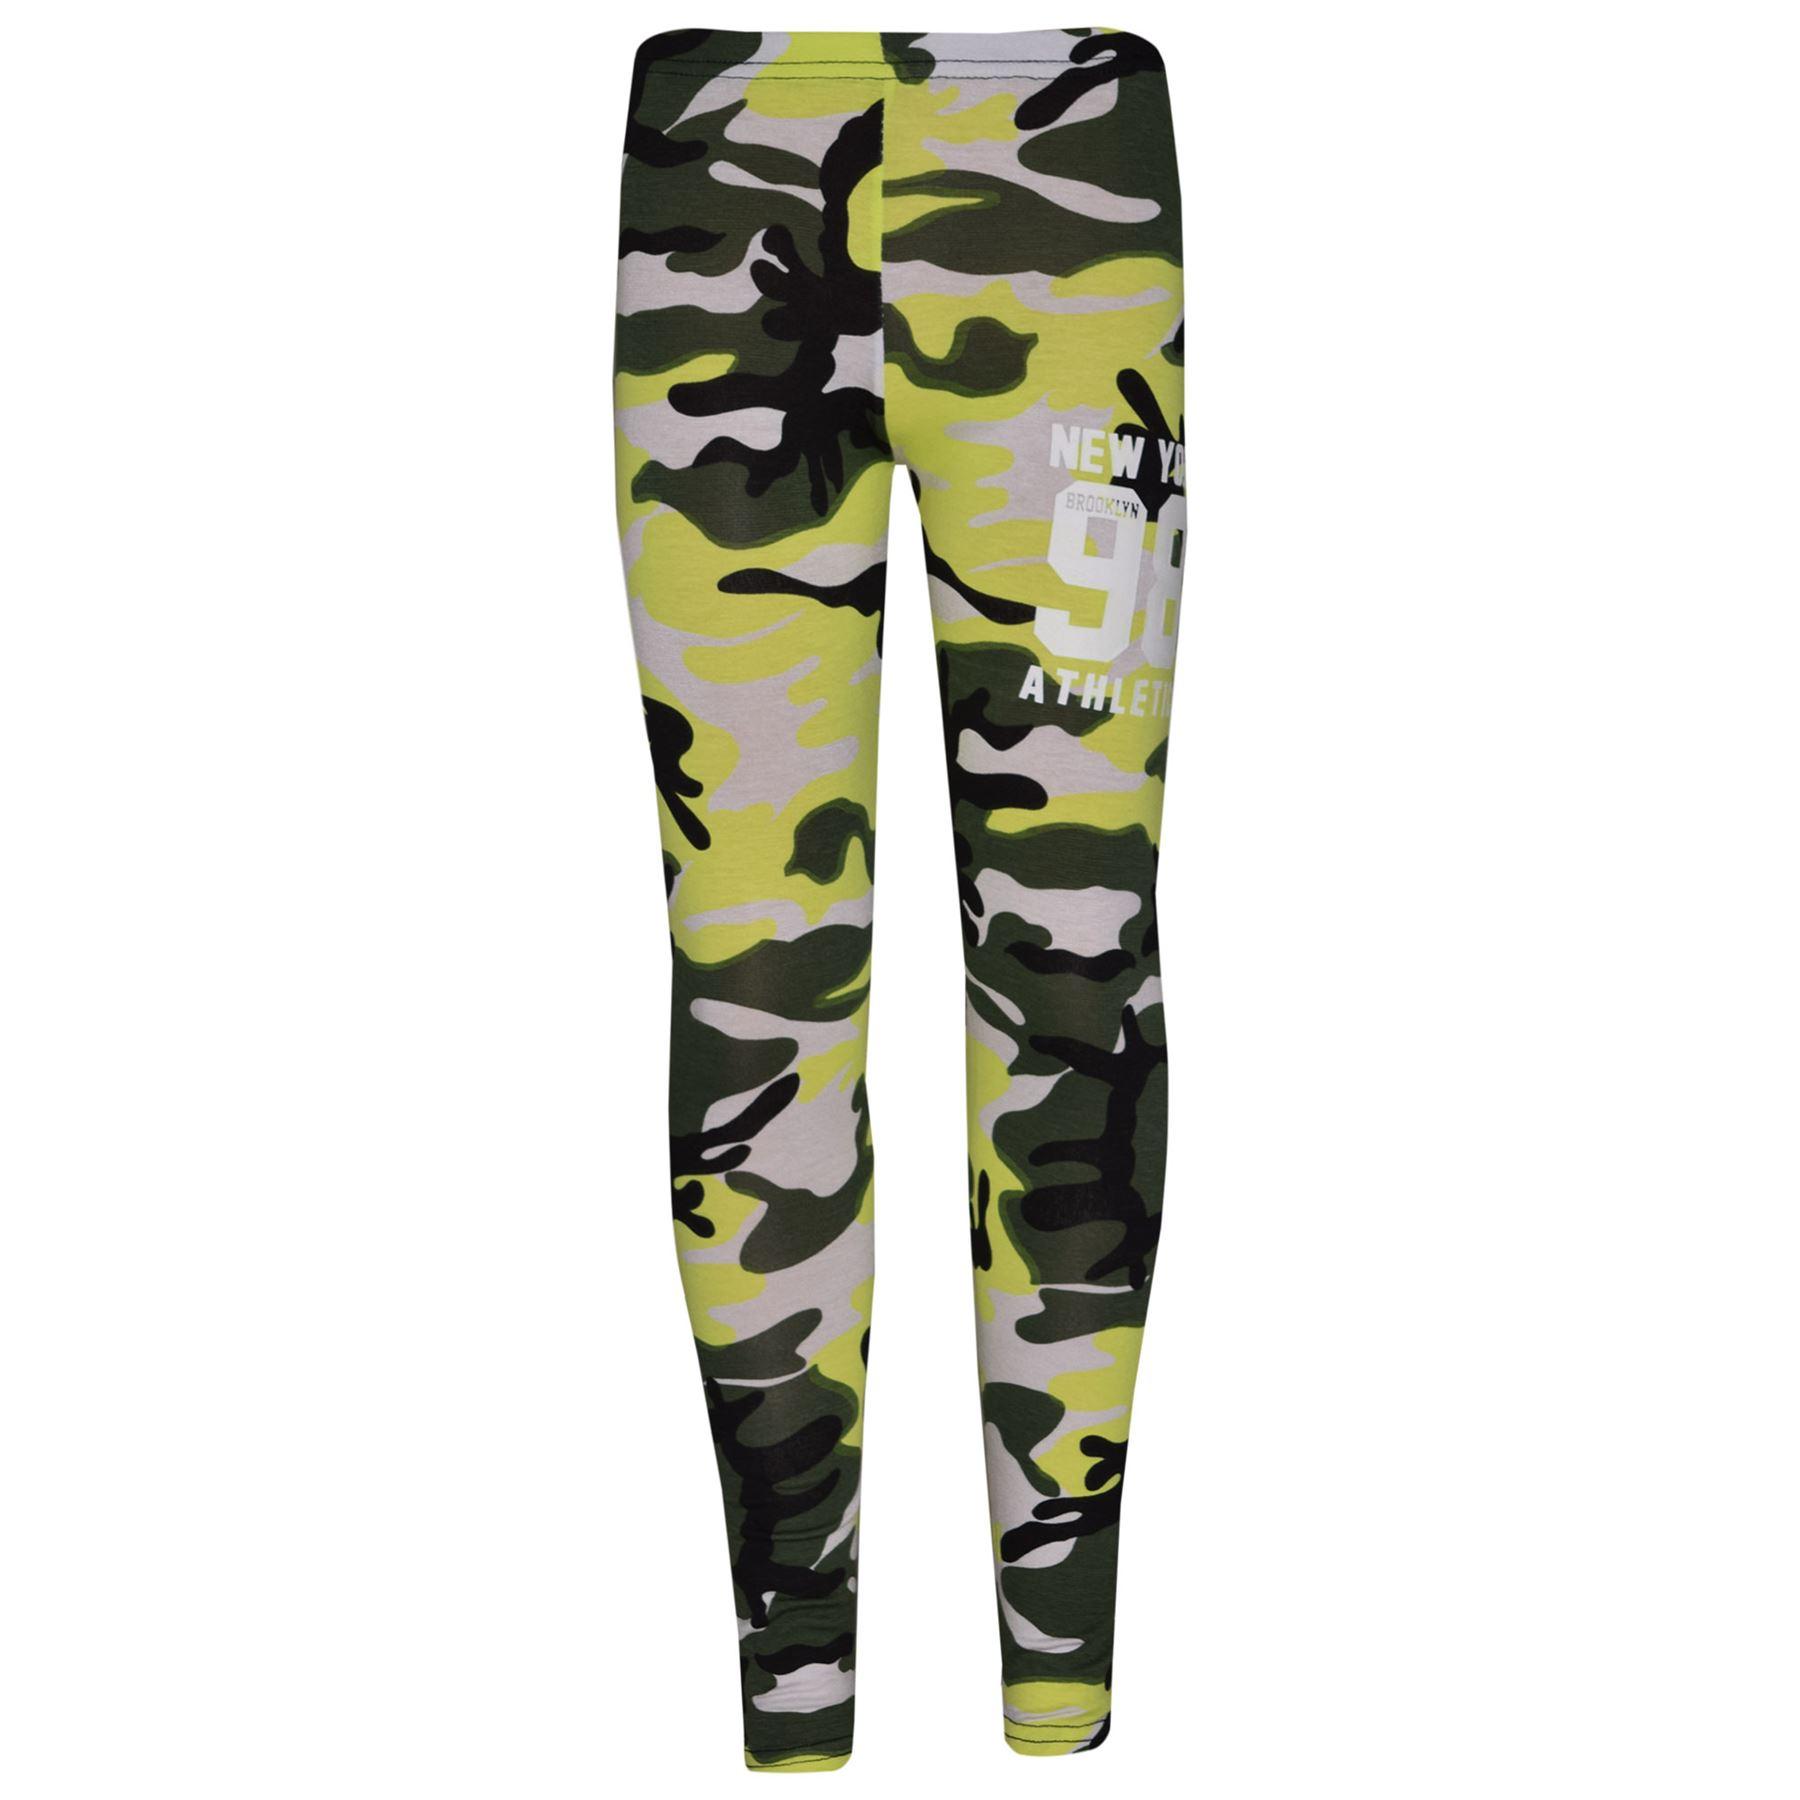 Girls-NEW-YORK-BROOKLYN-98-ATHLECTIC-Camouflage-Print-Top-amp-Legging-Set-7-13-Yr thumbnail 36